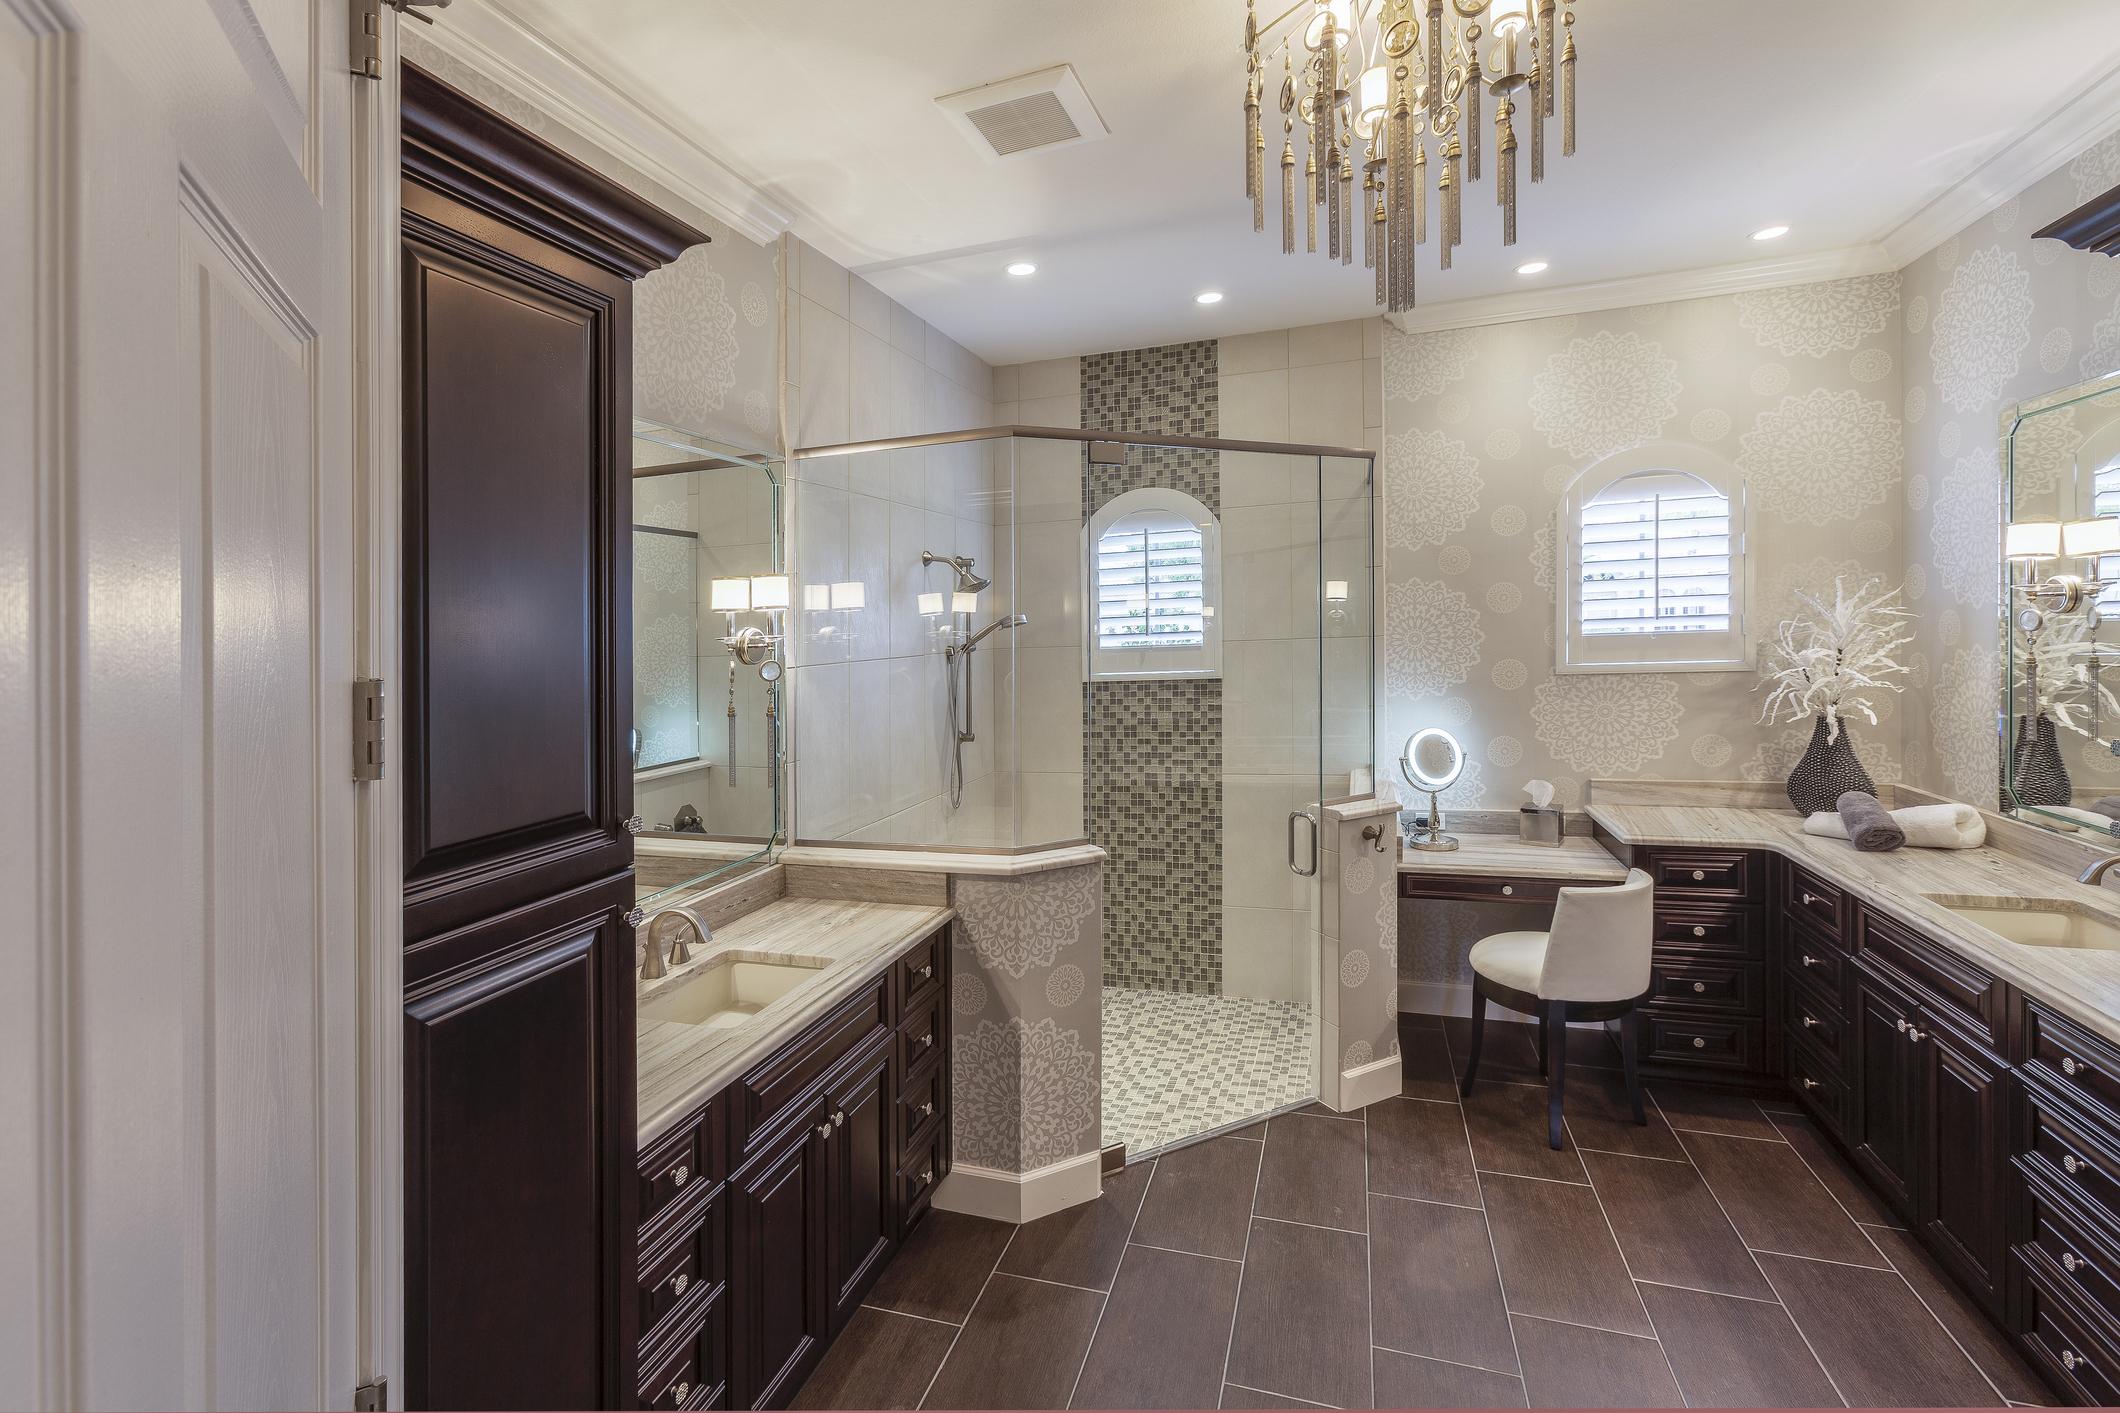 Luxury master bathroom with chandelier